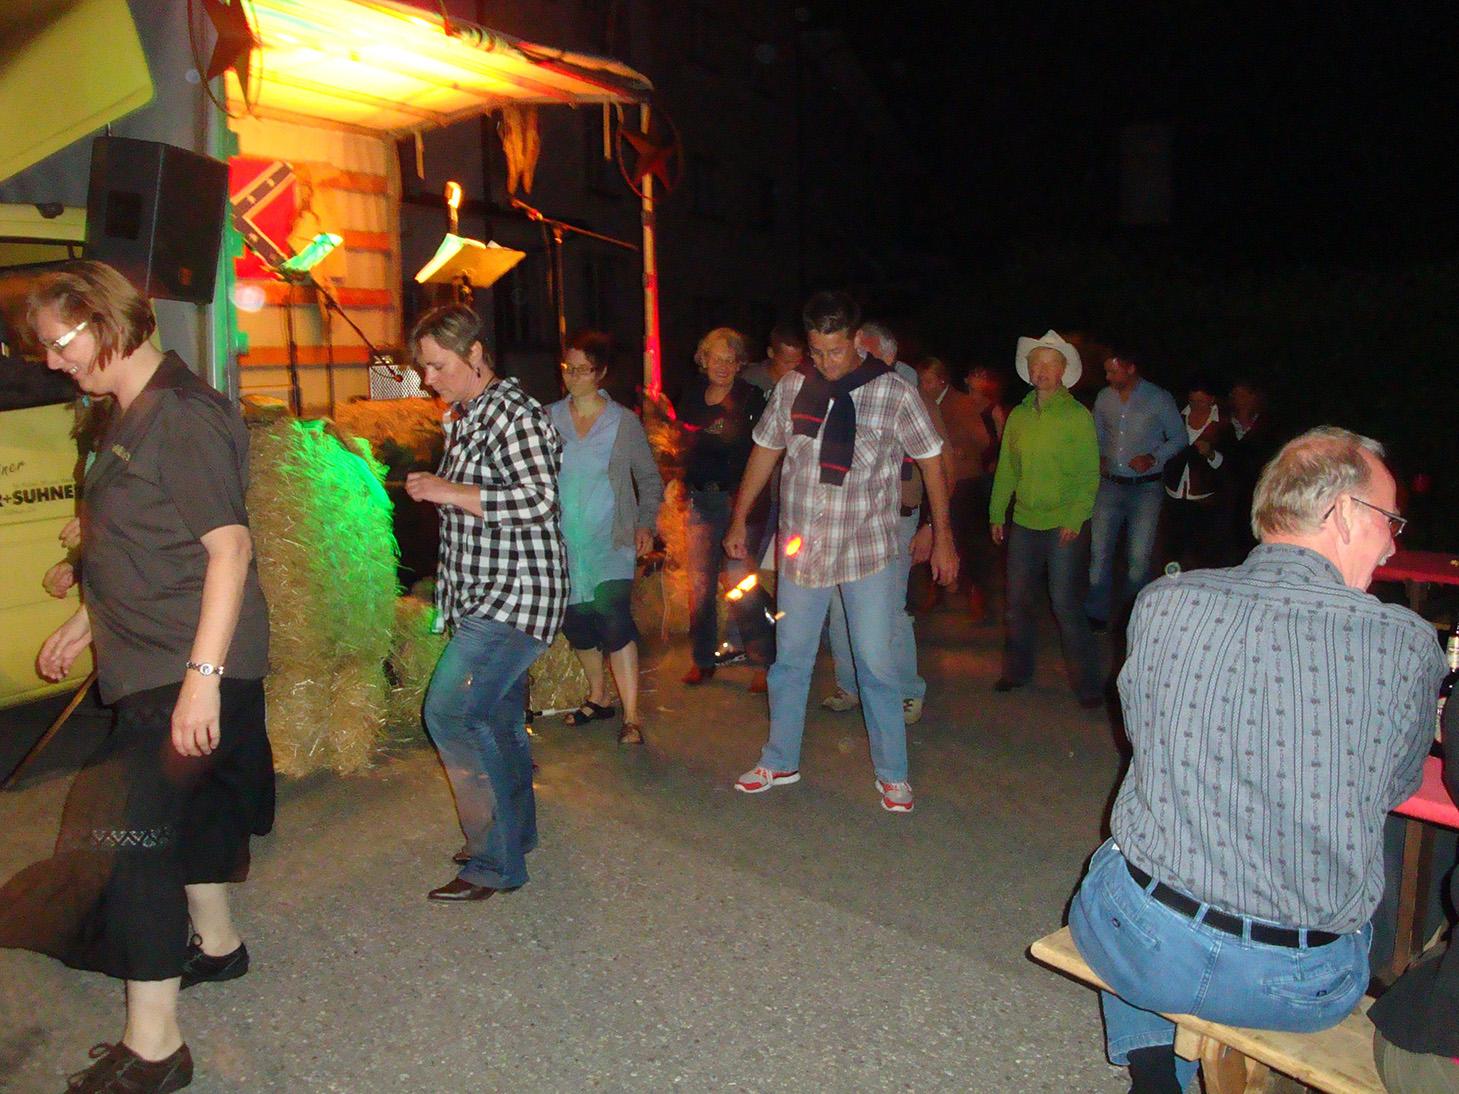 Country_Summer_Night_096_Web